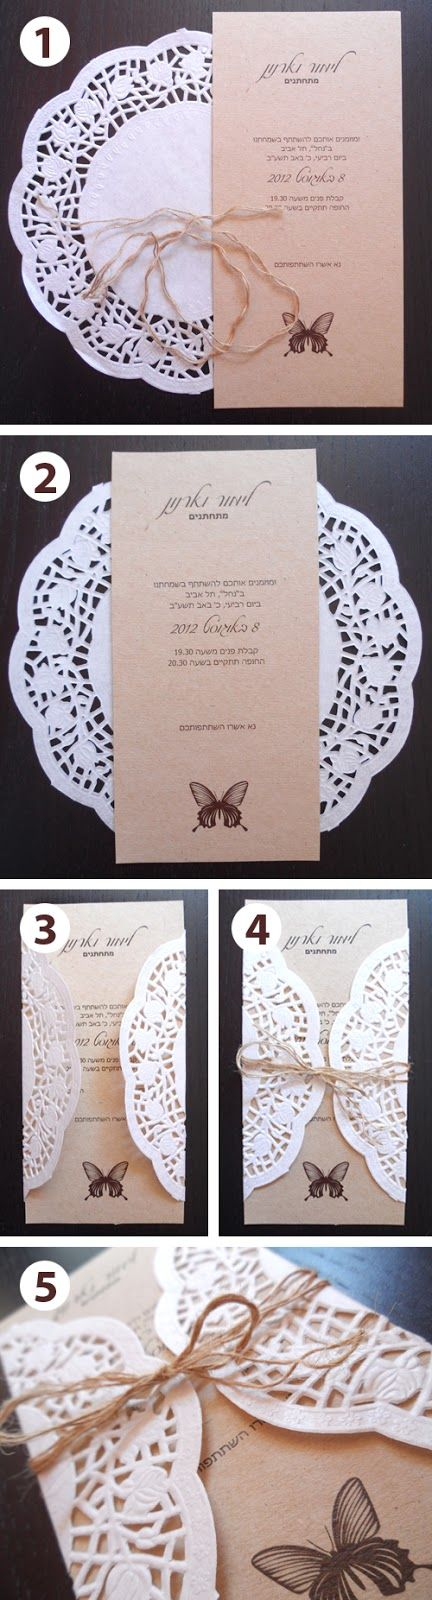 DIY wedding invitation - cheap but beautiful